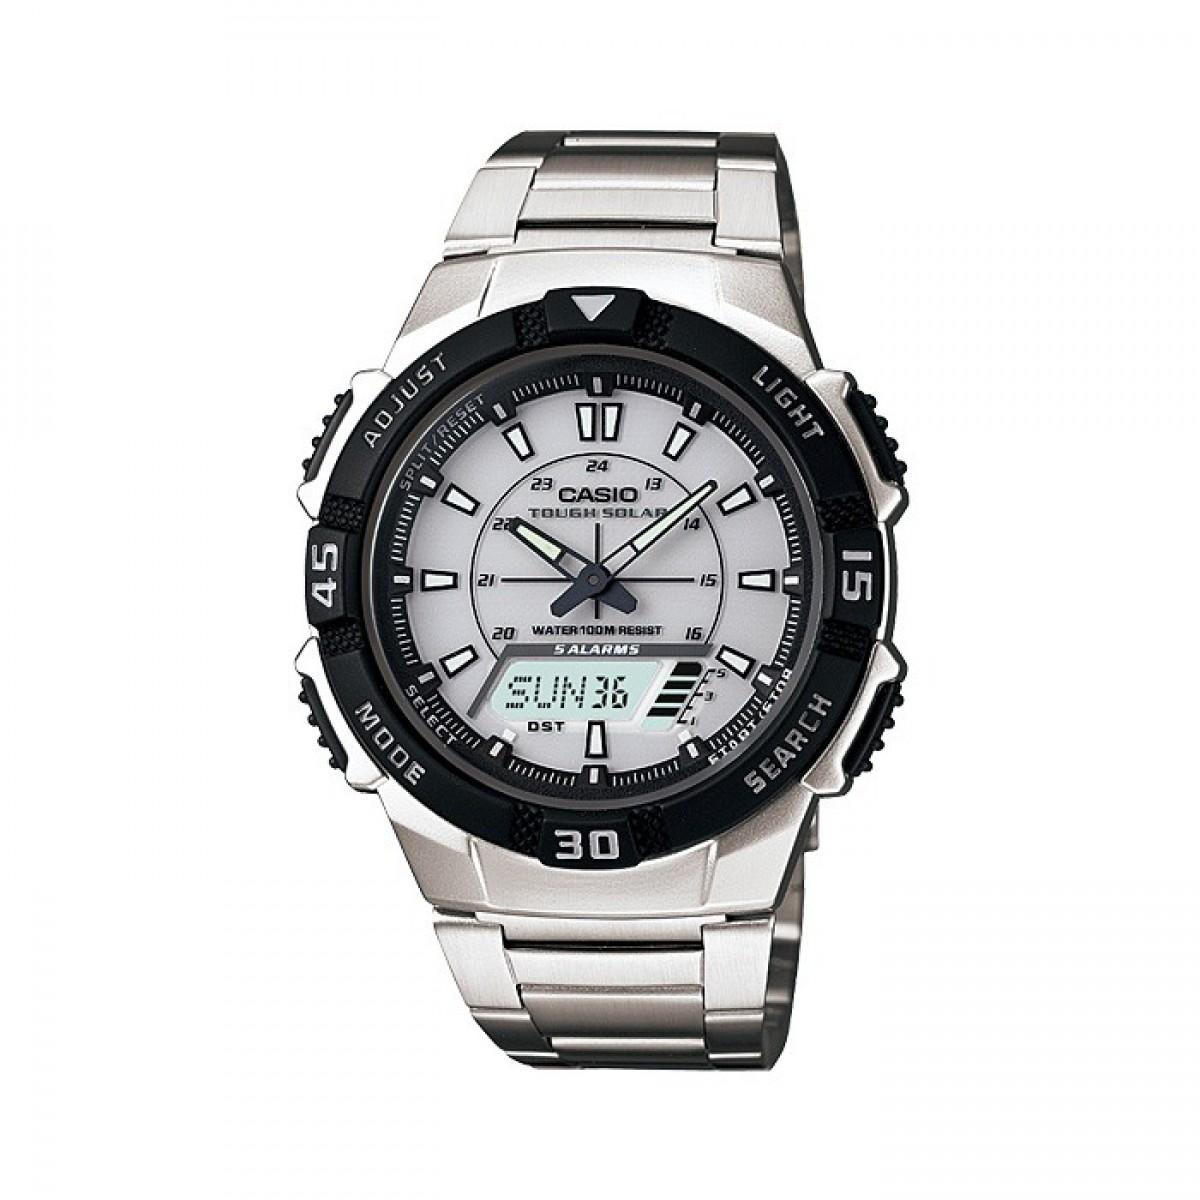 Часовник Casio AQ-S800WD-7EV